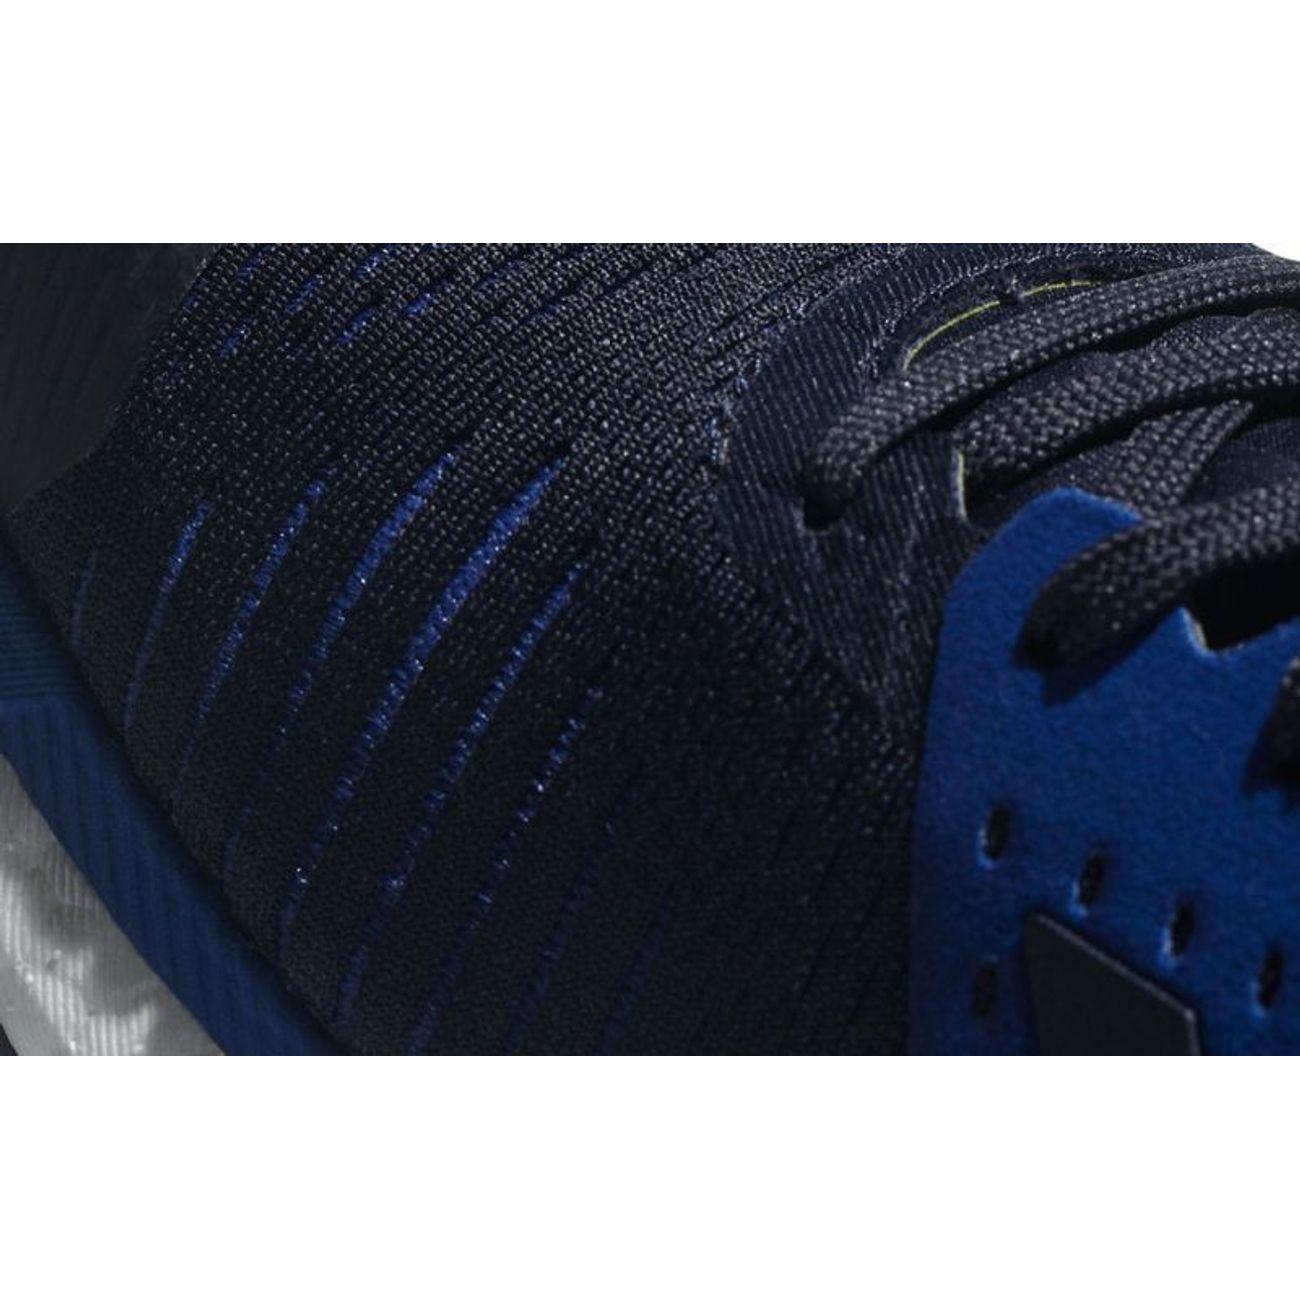 premium selection 7cb0a 5db27 ... running homme ADIDAS Adidas - solar glide st Hommes chaussure de course  (noirbleu ...